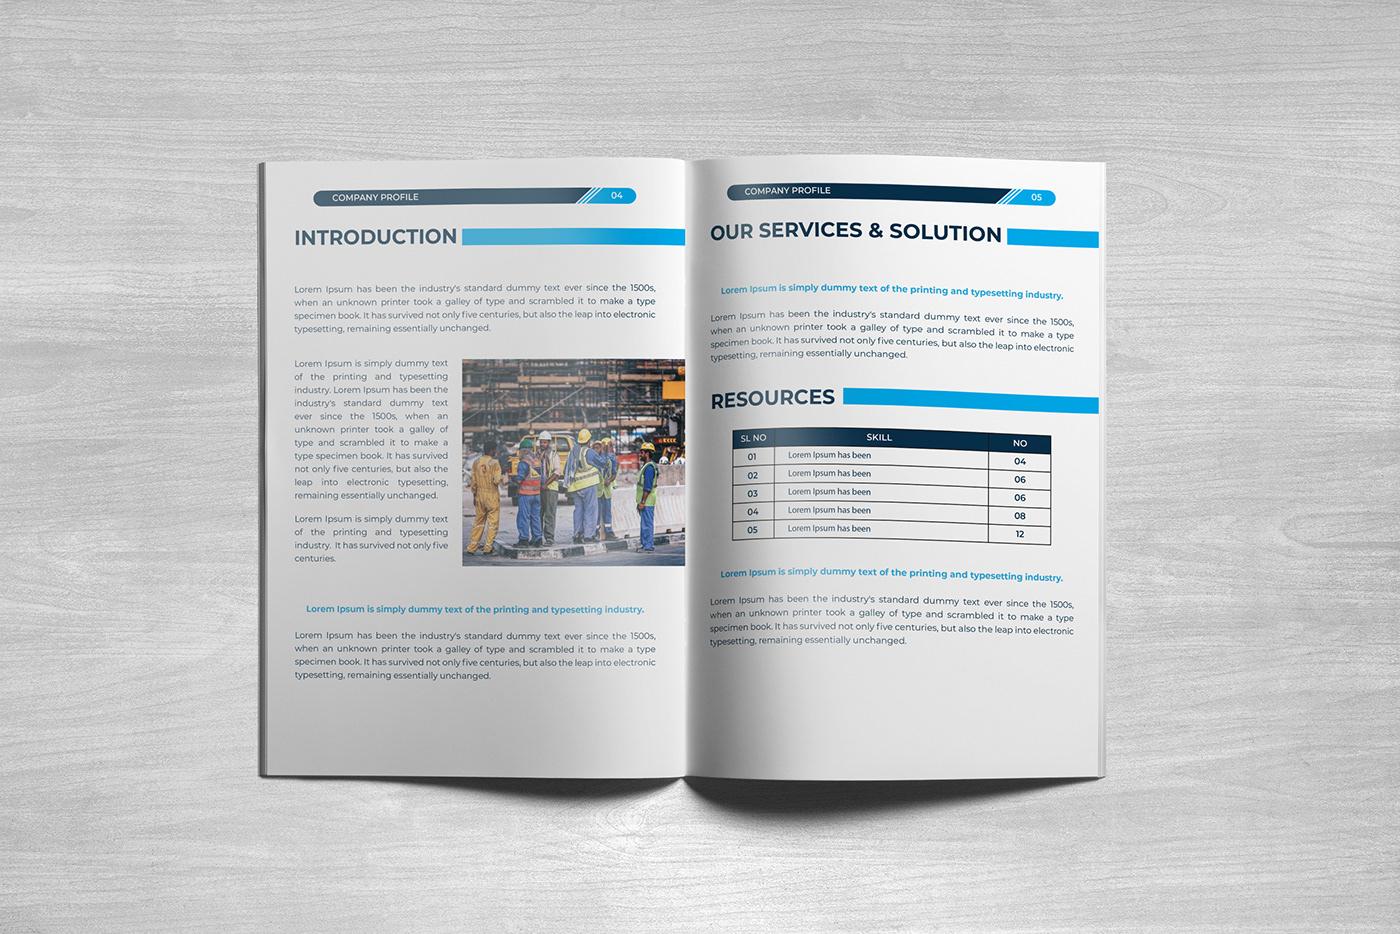 Company Profile Free company profile template Company profile design business brochure Free Template brochure ai template design company proifle